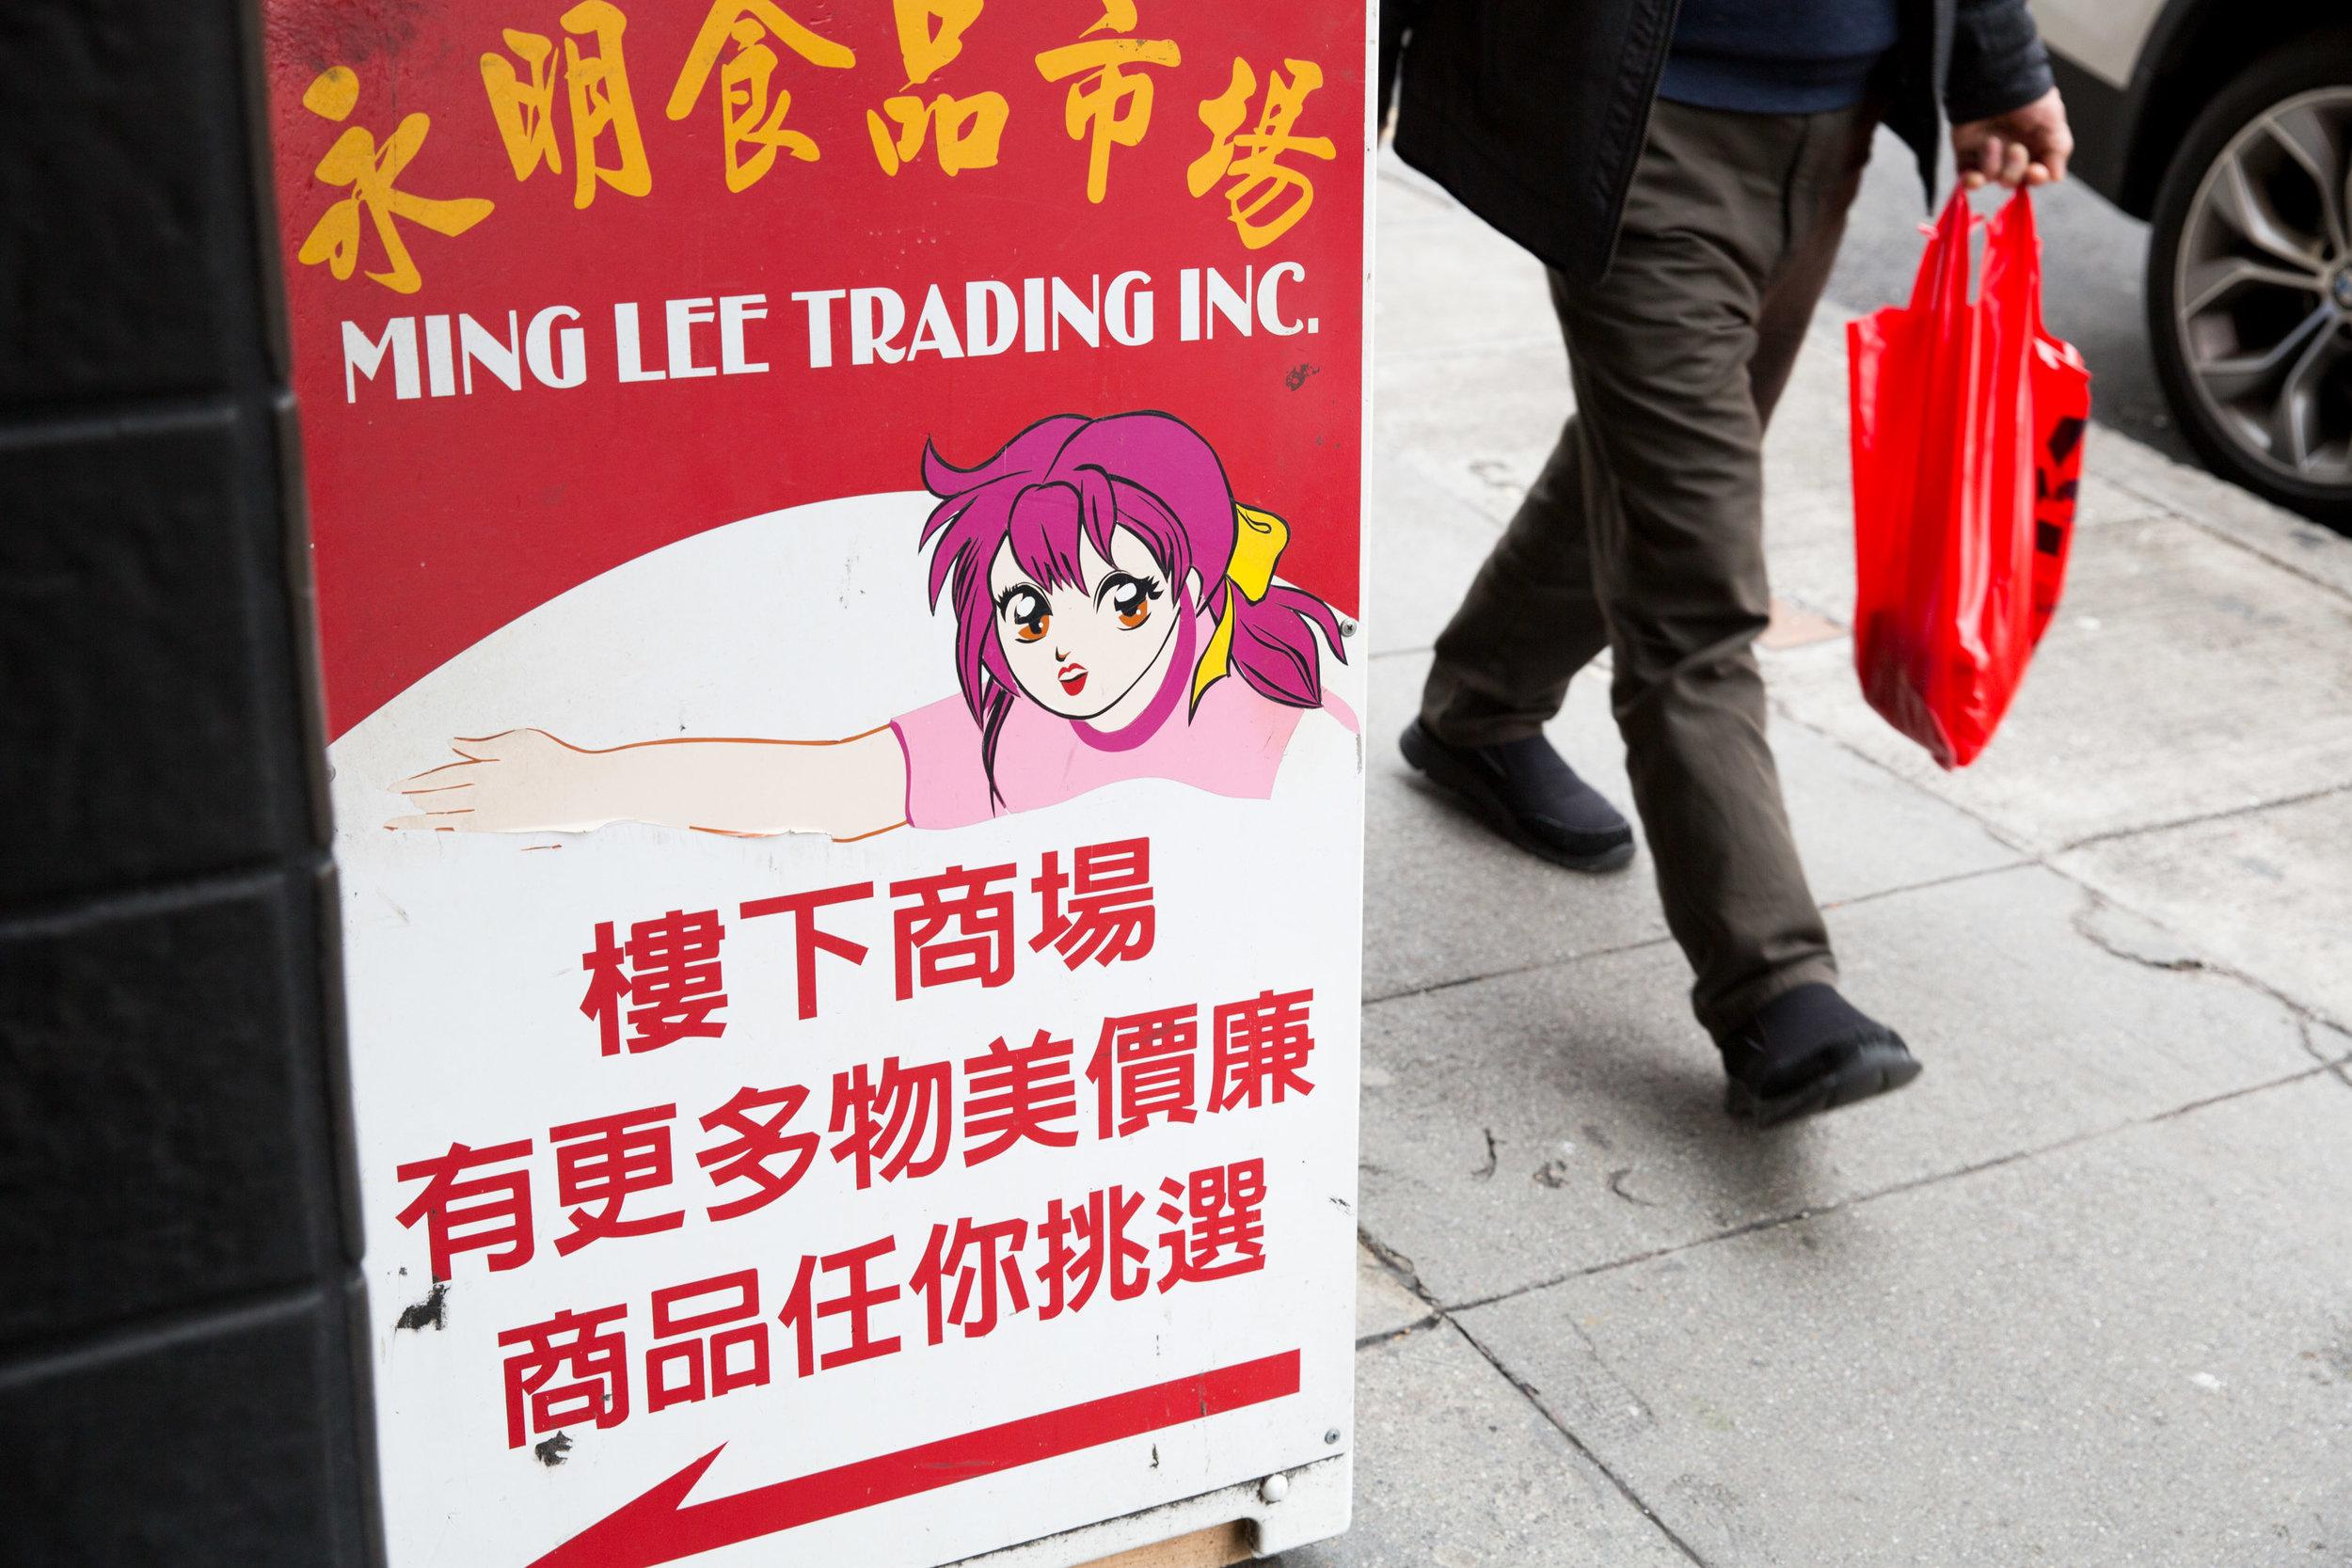 MingLeeTradingCo_WebsiteSelects_015.JPG